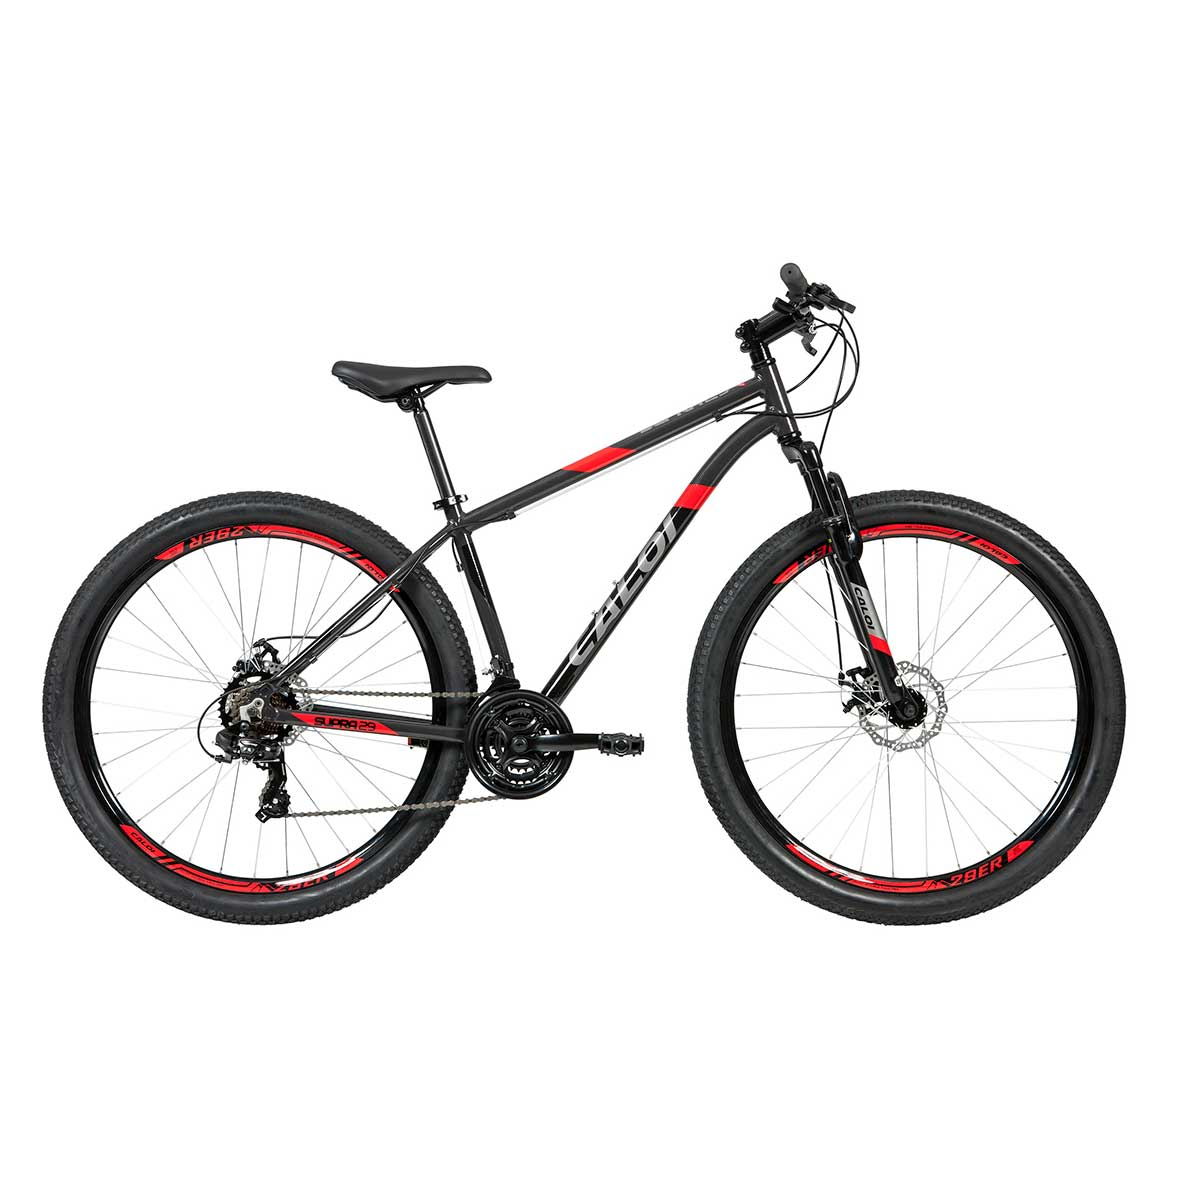 Bicicleta Caloi Supra MTB Mountain Bike Aro 29